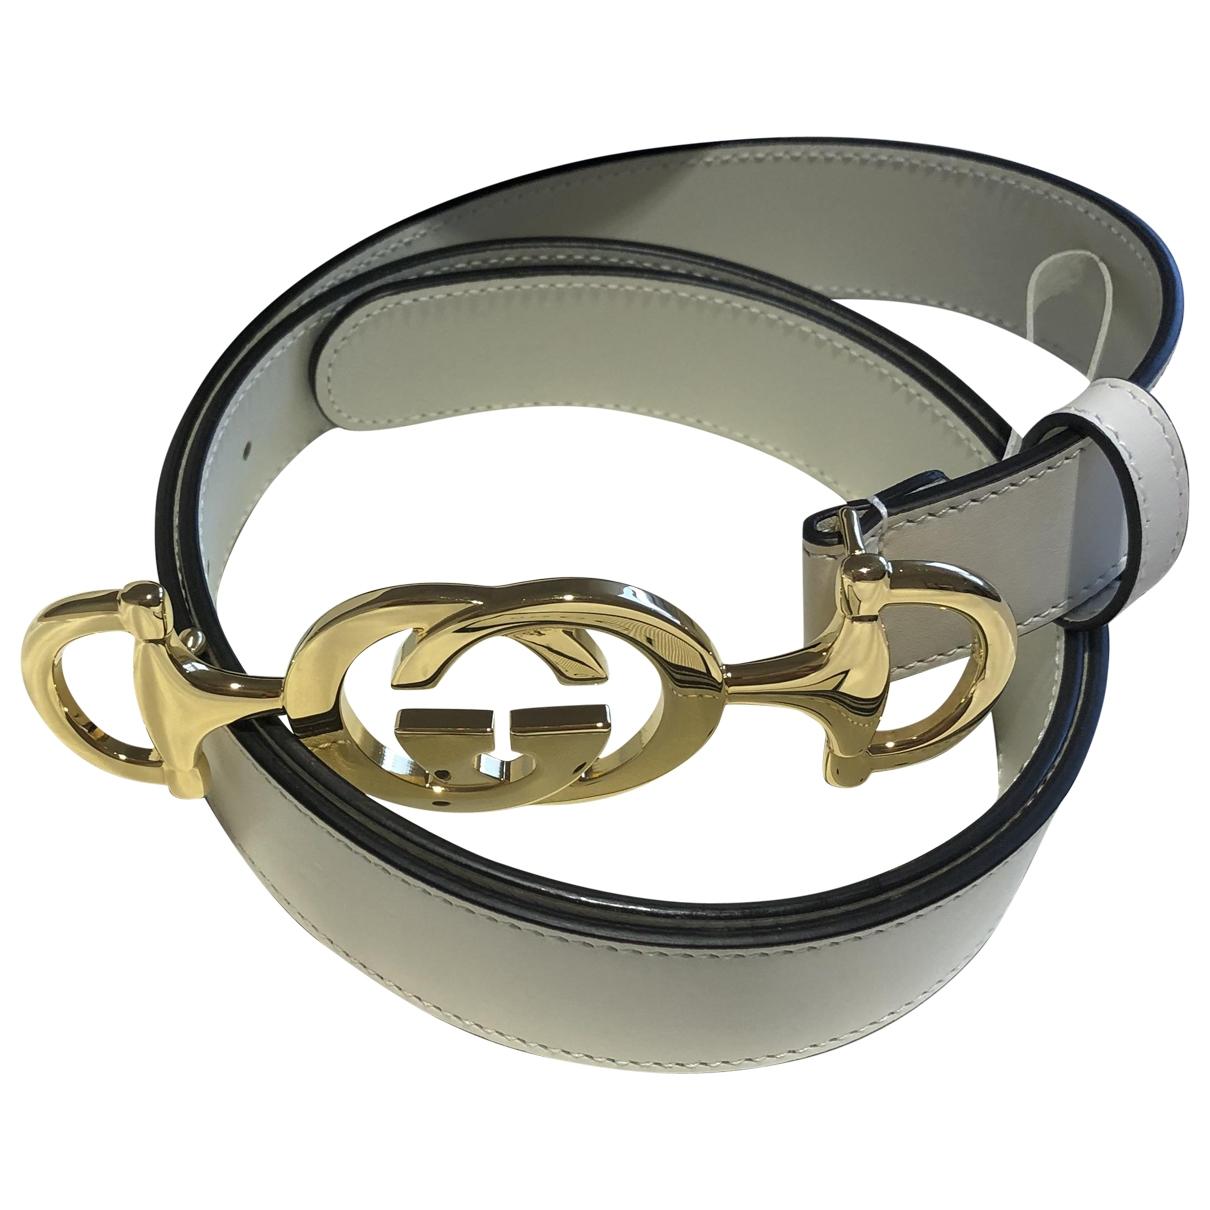 Gucci Interlocking Buckle White Leather belt for Women 95 cm